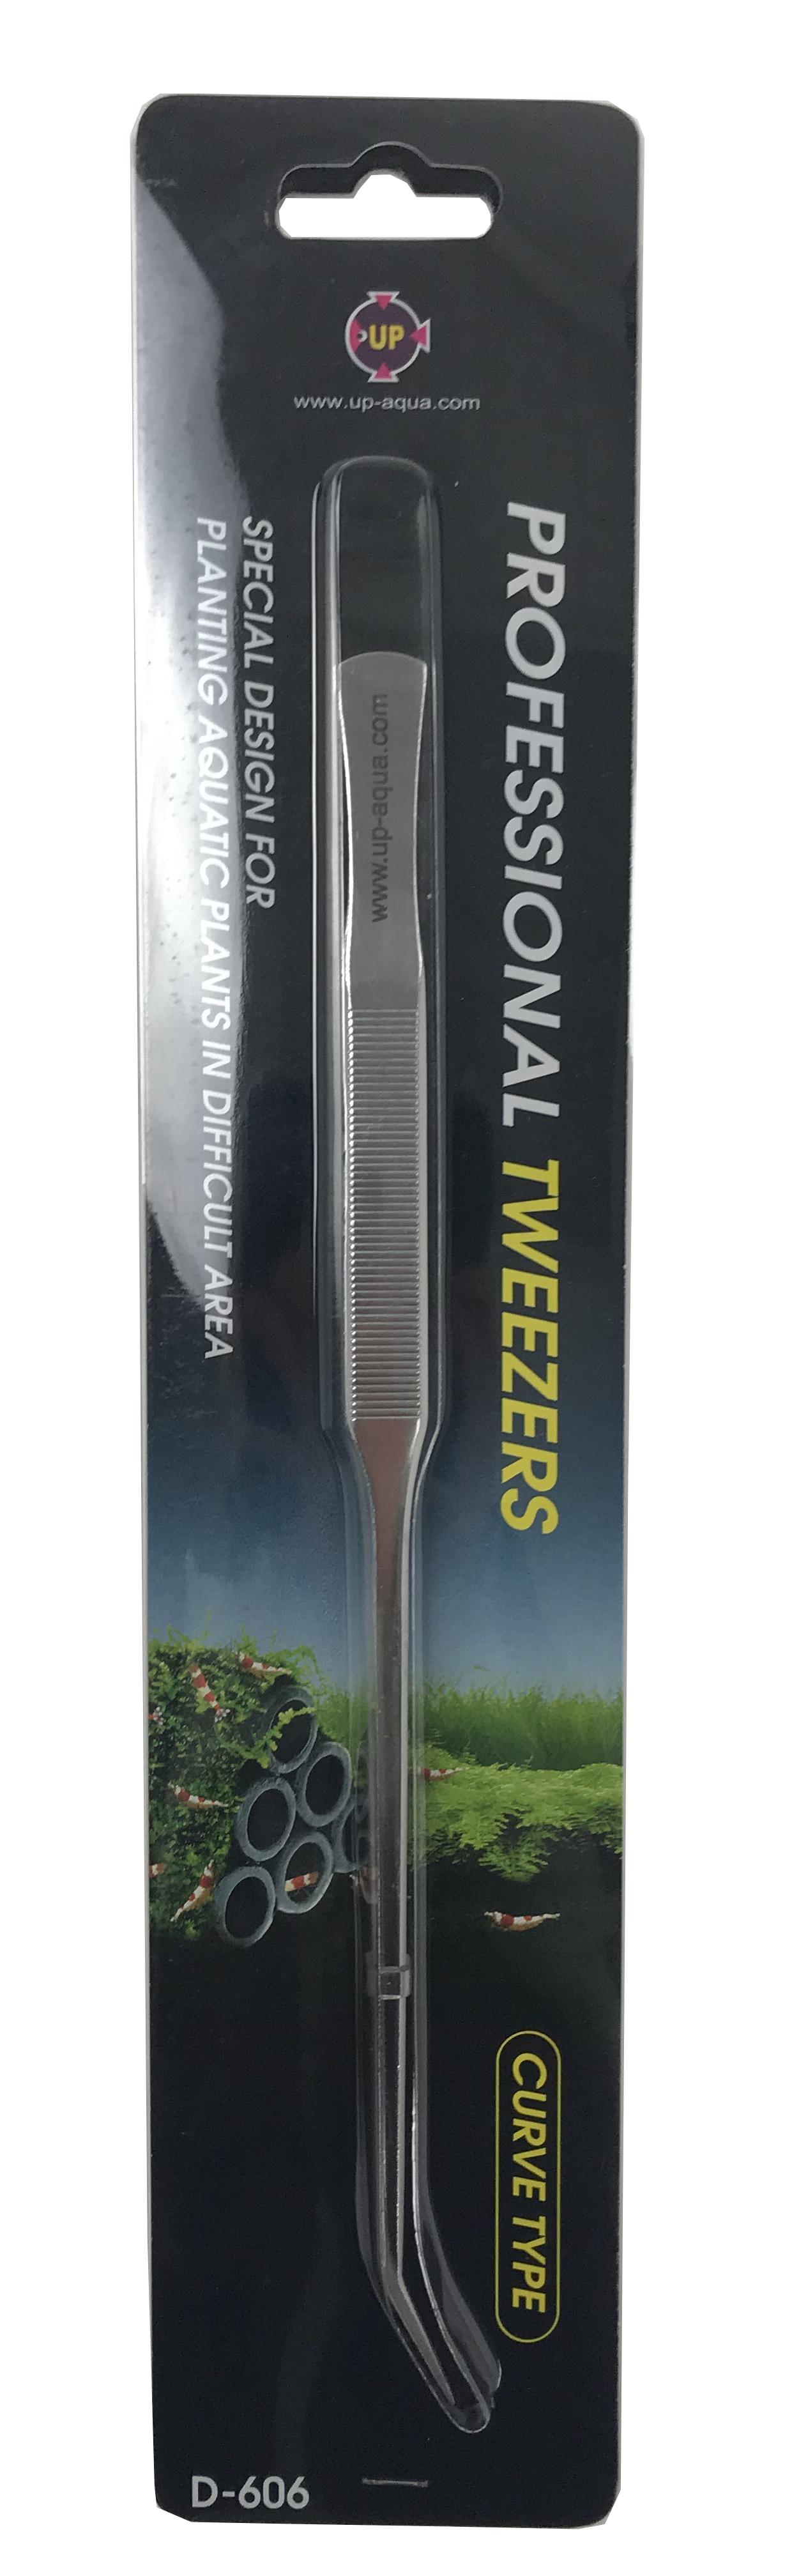 Tweezers - Curve Angle